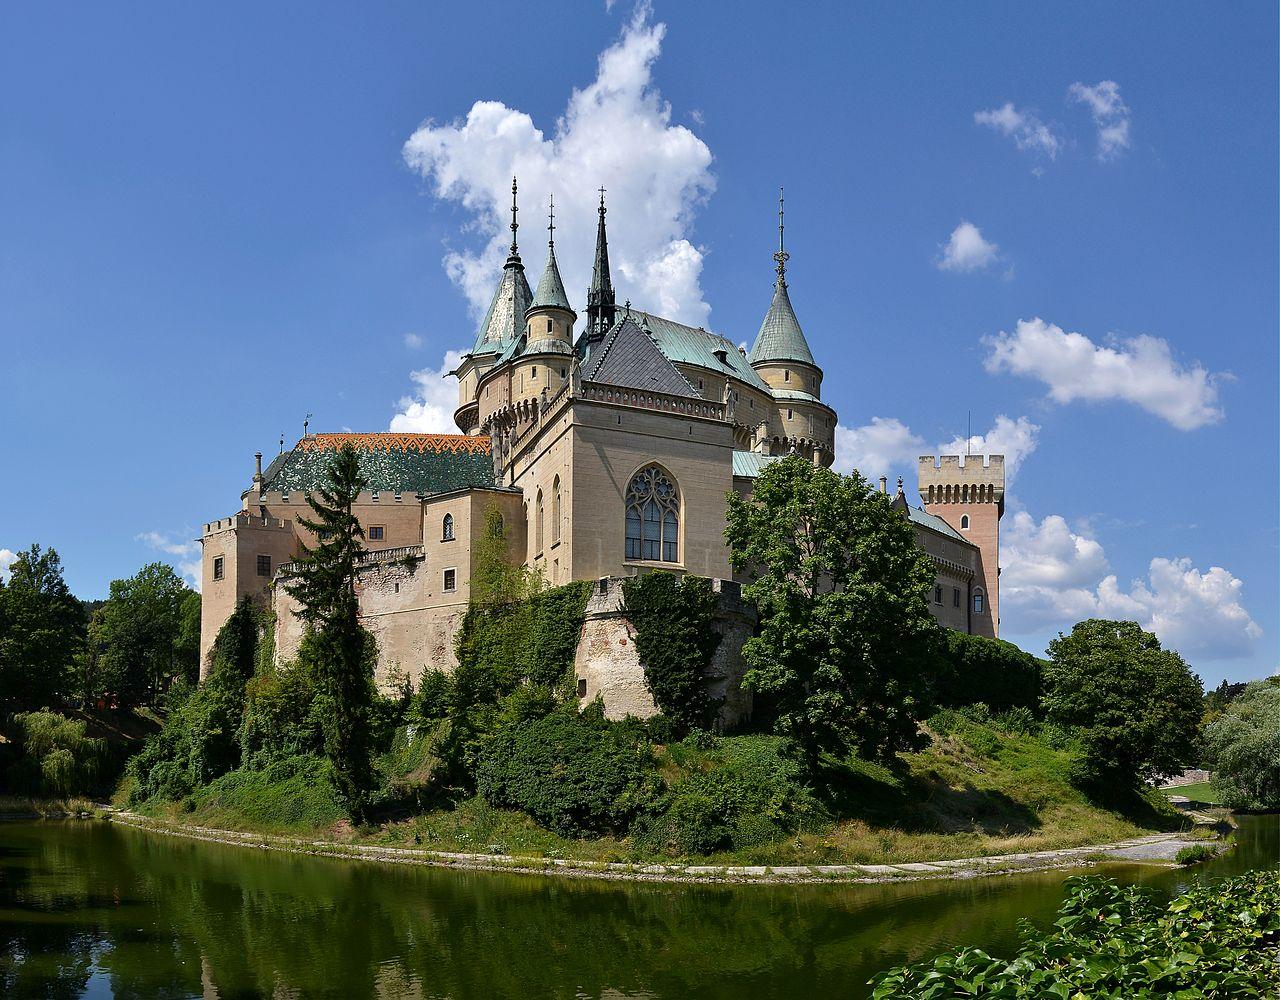 Bojnice castle in Slovakia [1280x1000][OS]